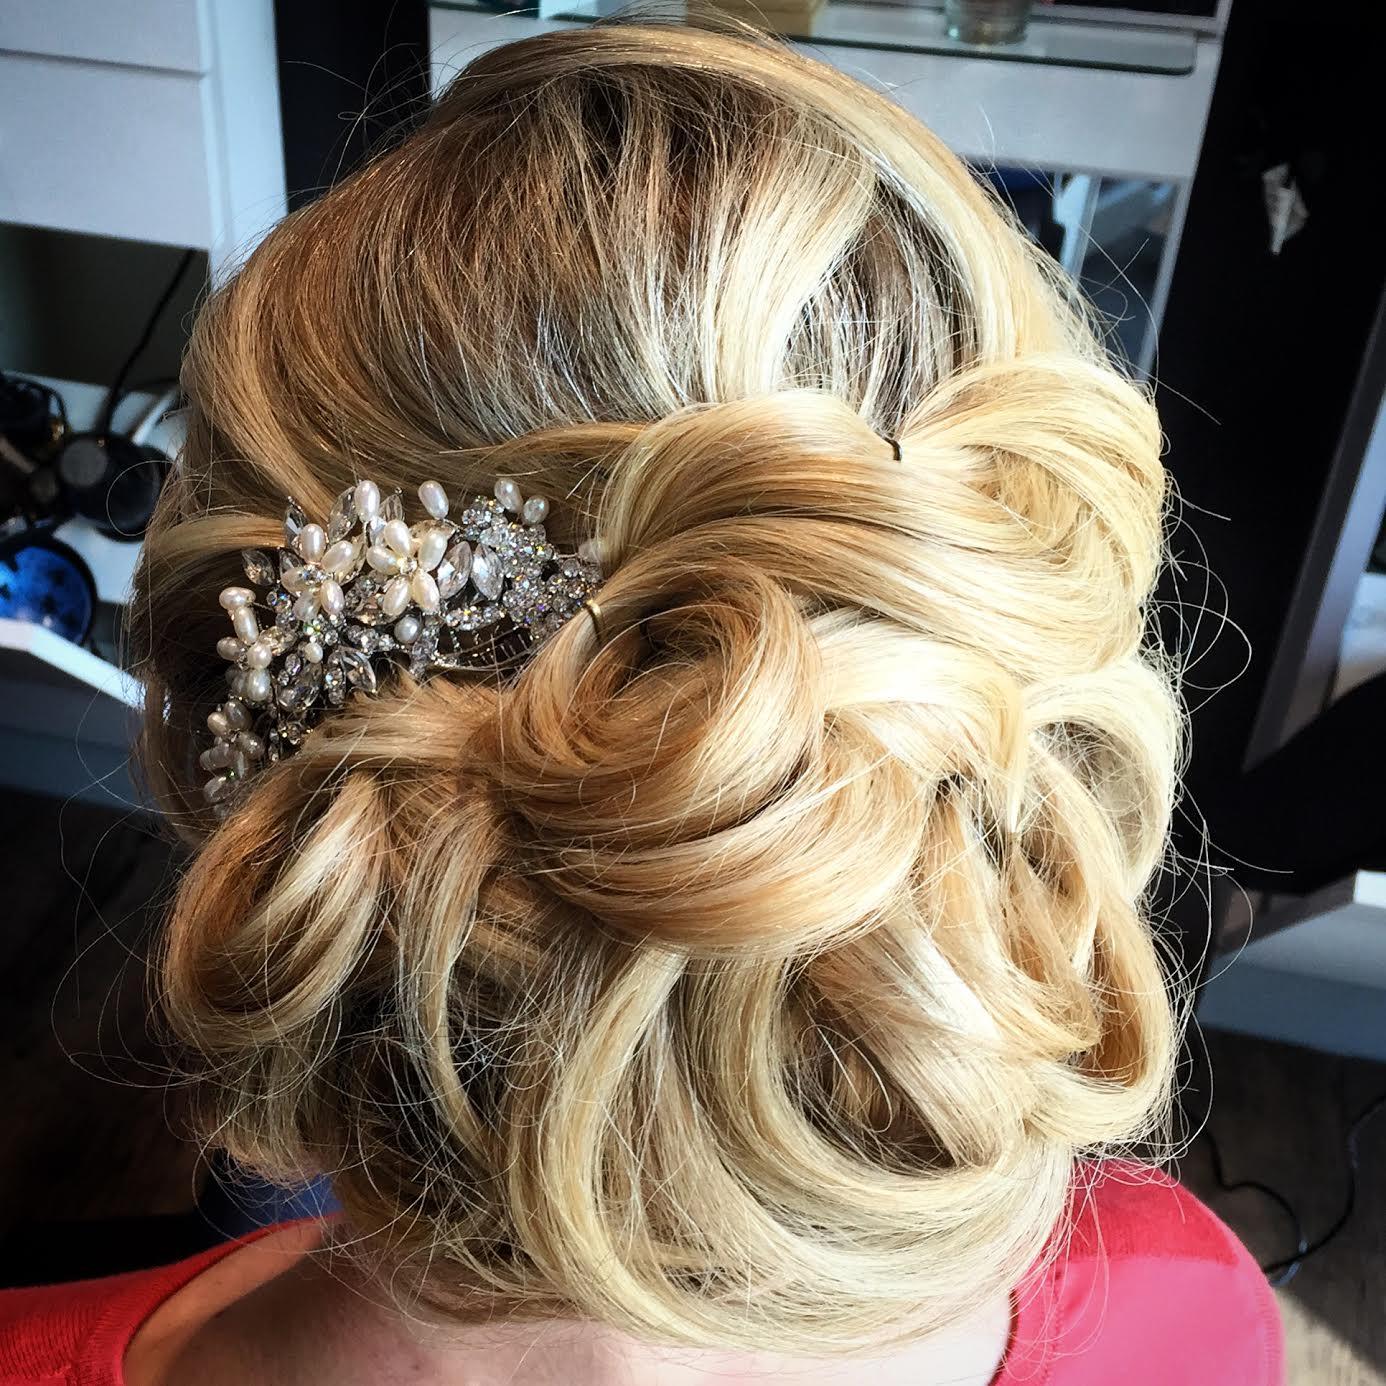 Kevin Walsh Dallas Texas Hairstylist Bridal Updo